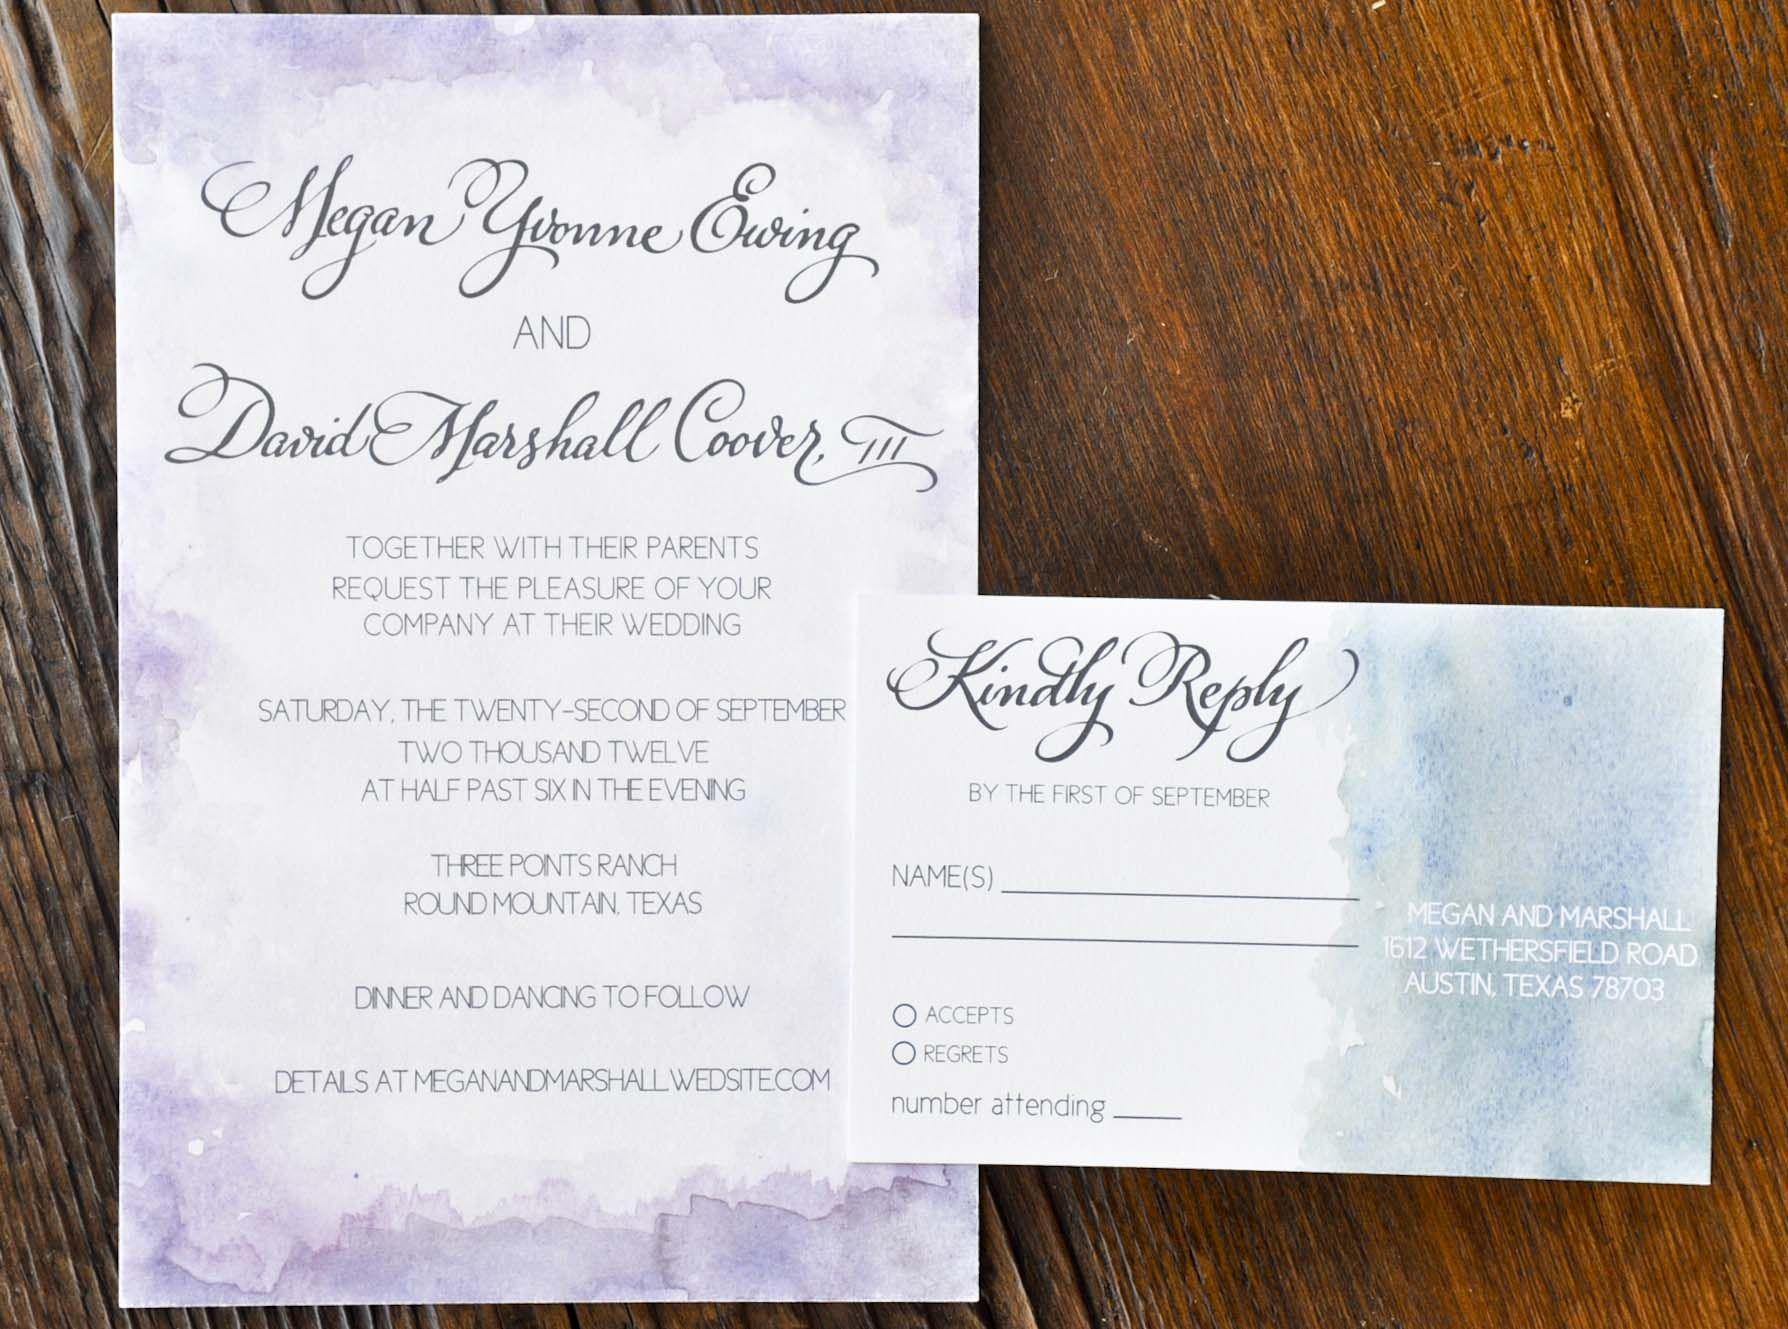 watercolor wedding invitations inviting affairs austin tx - Wedding Invitations Austin Tx